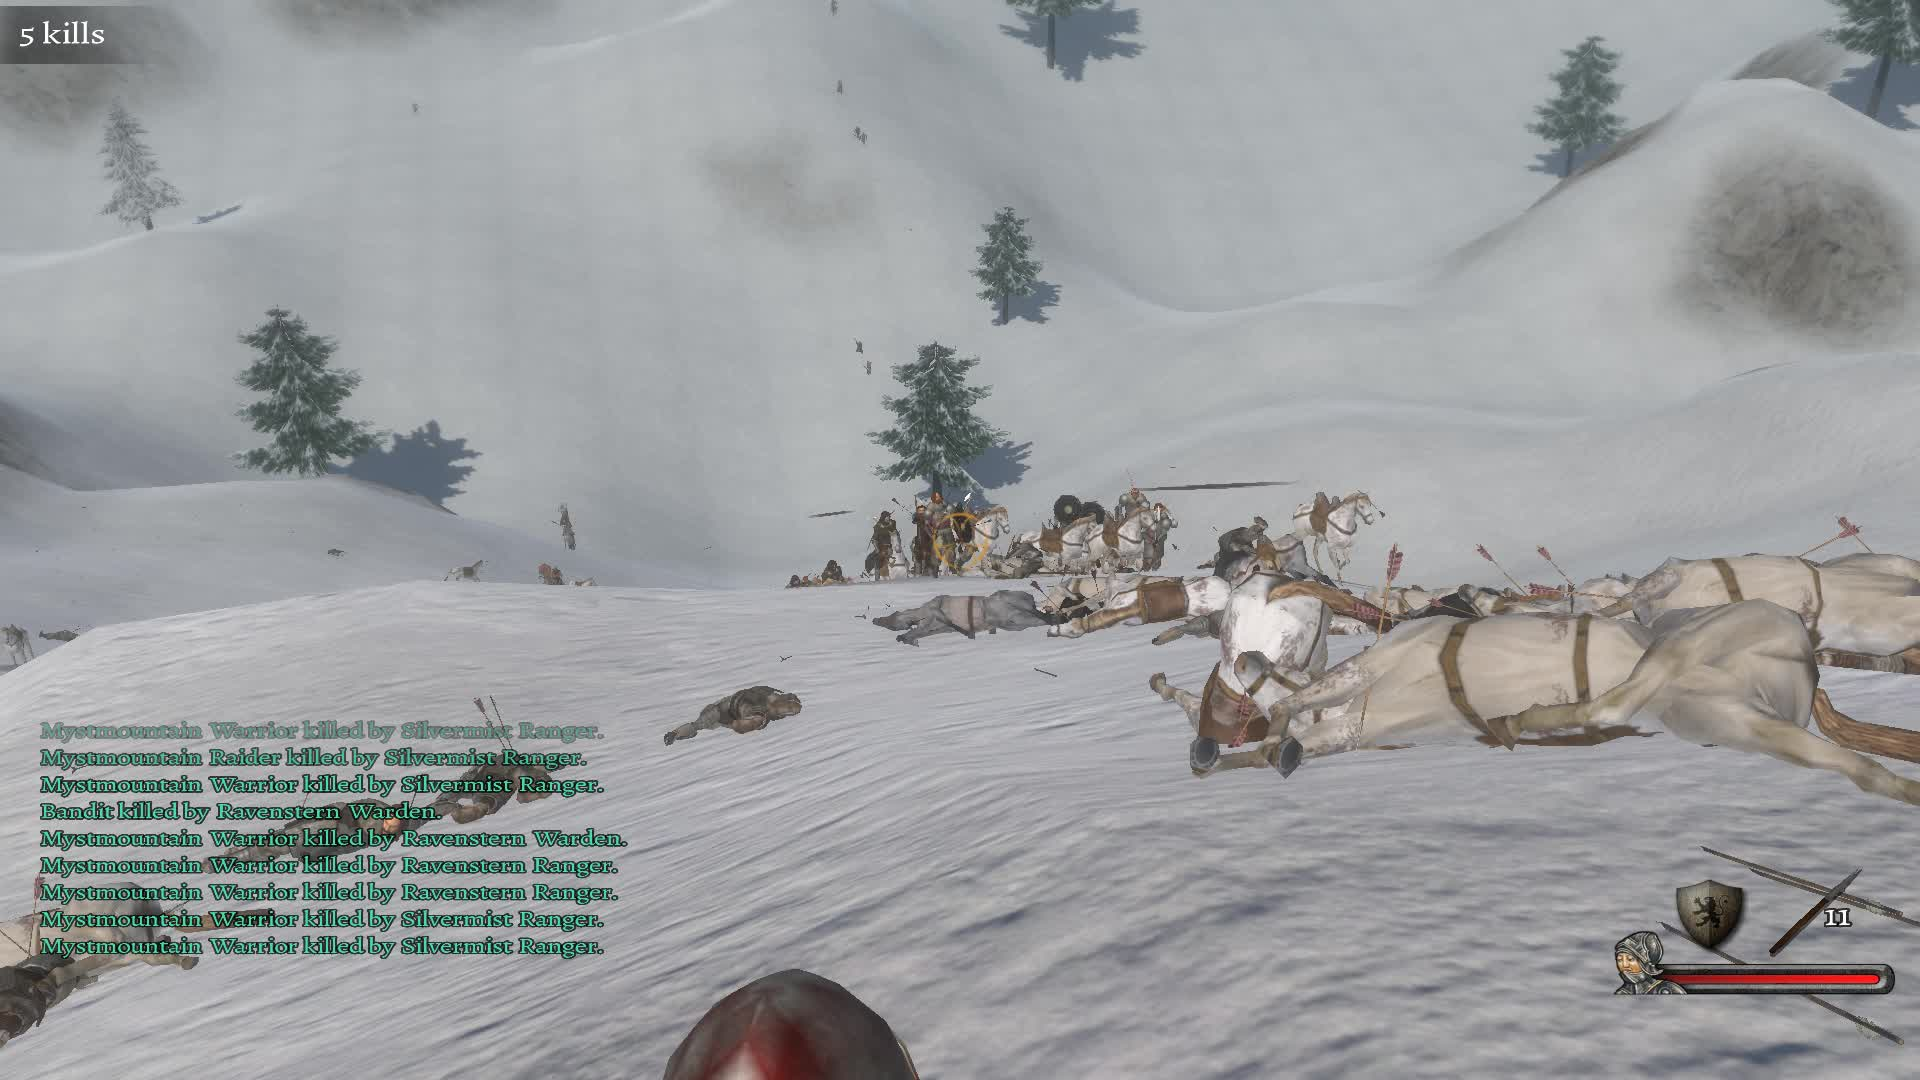 Satisfying Archery GIFs